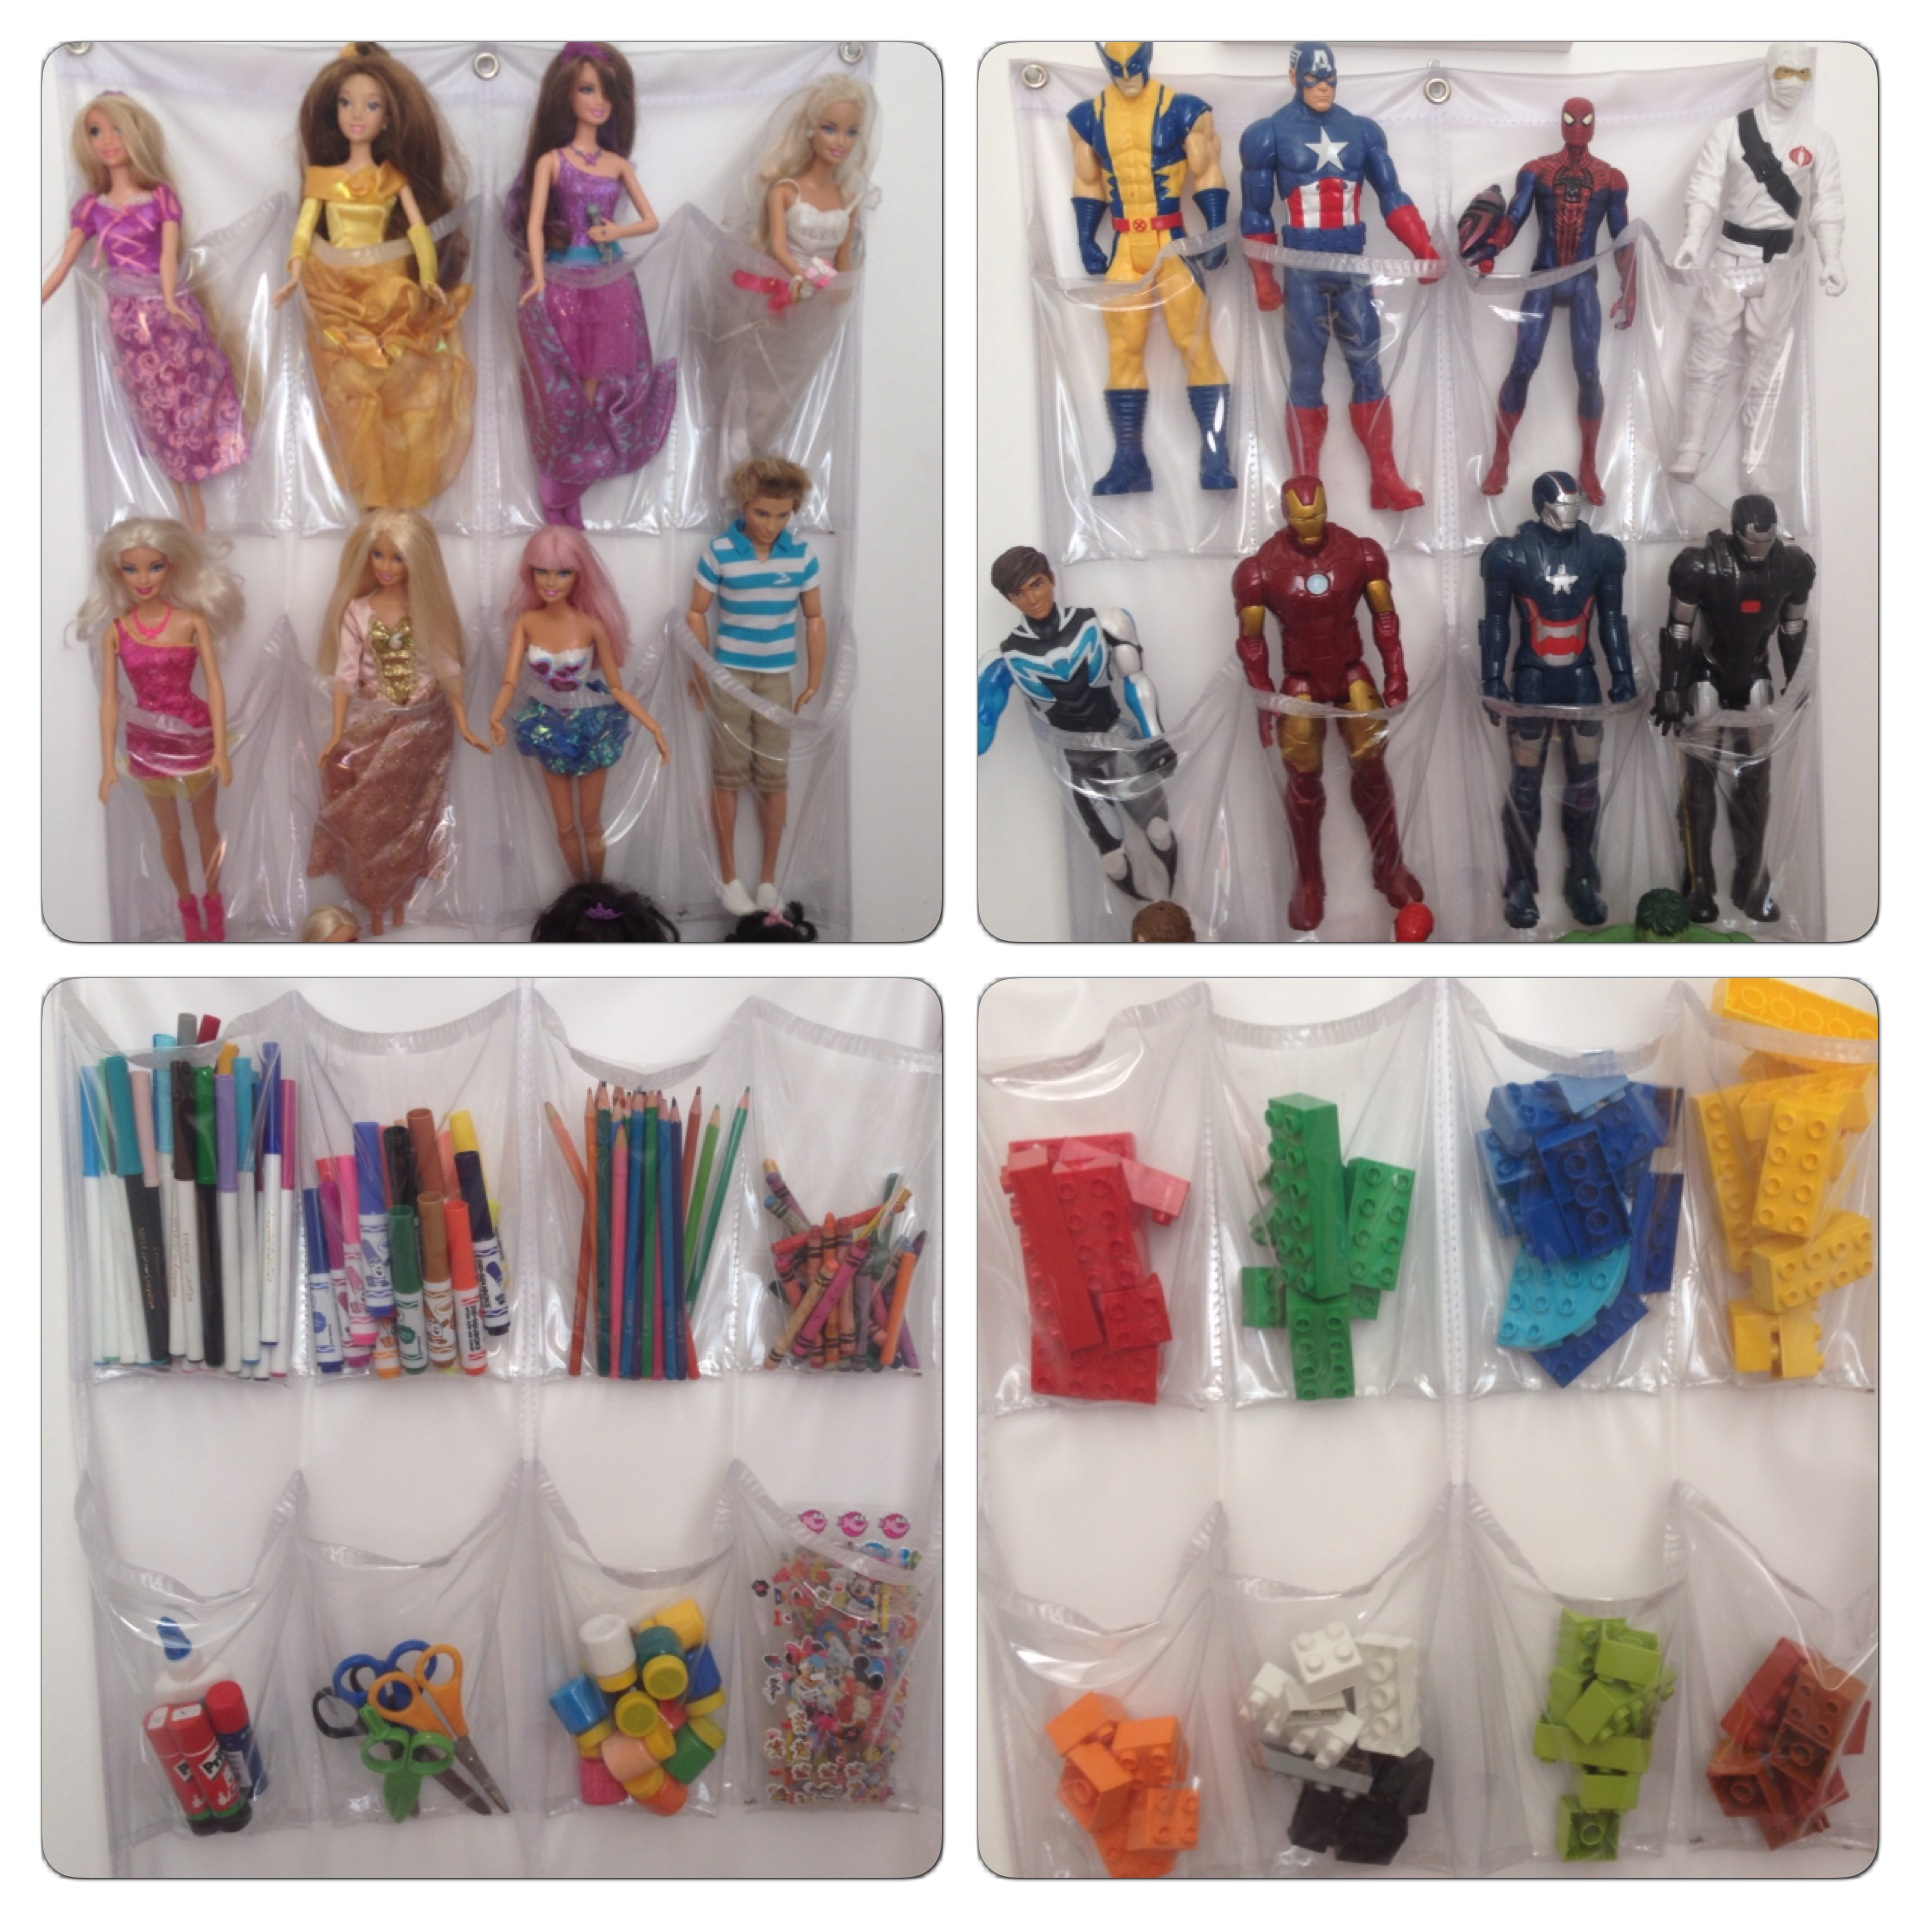 Organizando Os Brinquedos Claudia Matarazzo ~ Organizando O Quarto De Brinquedos